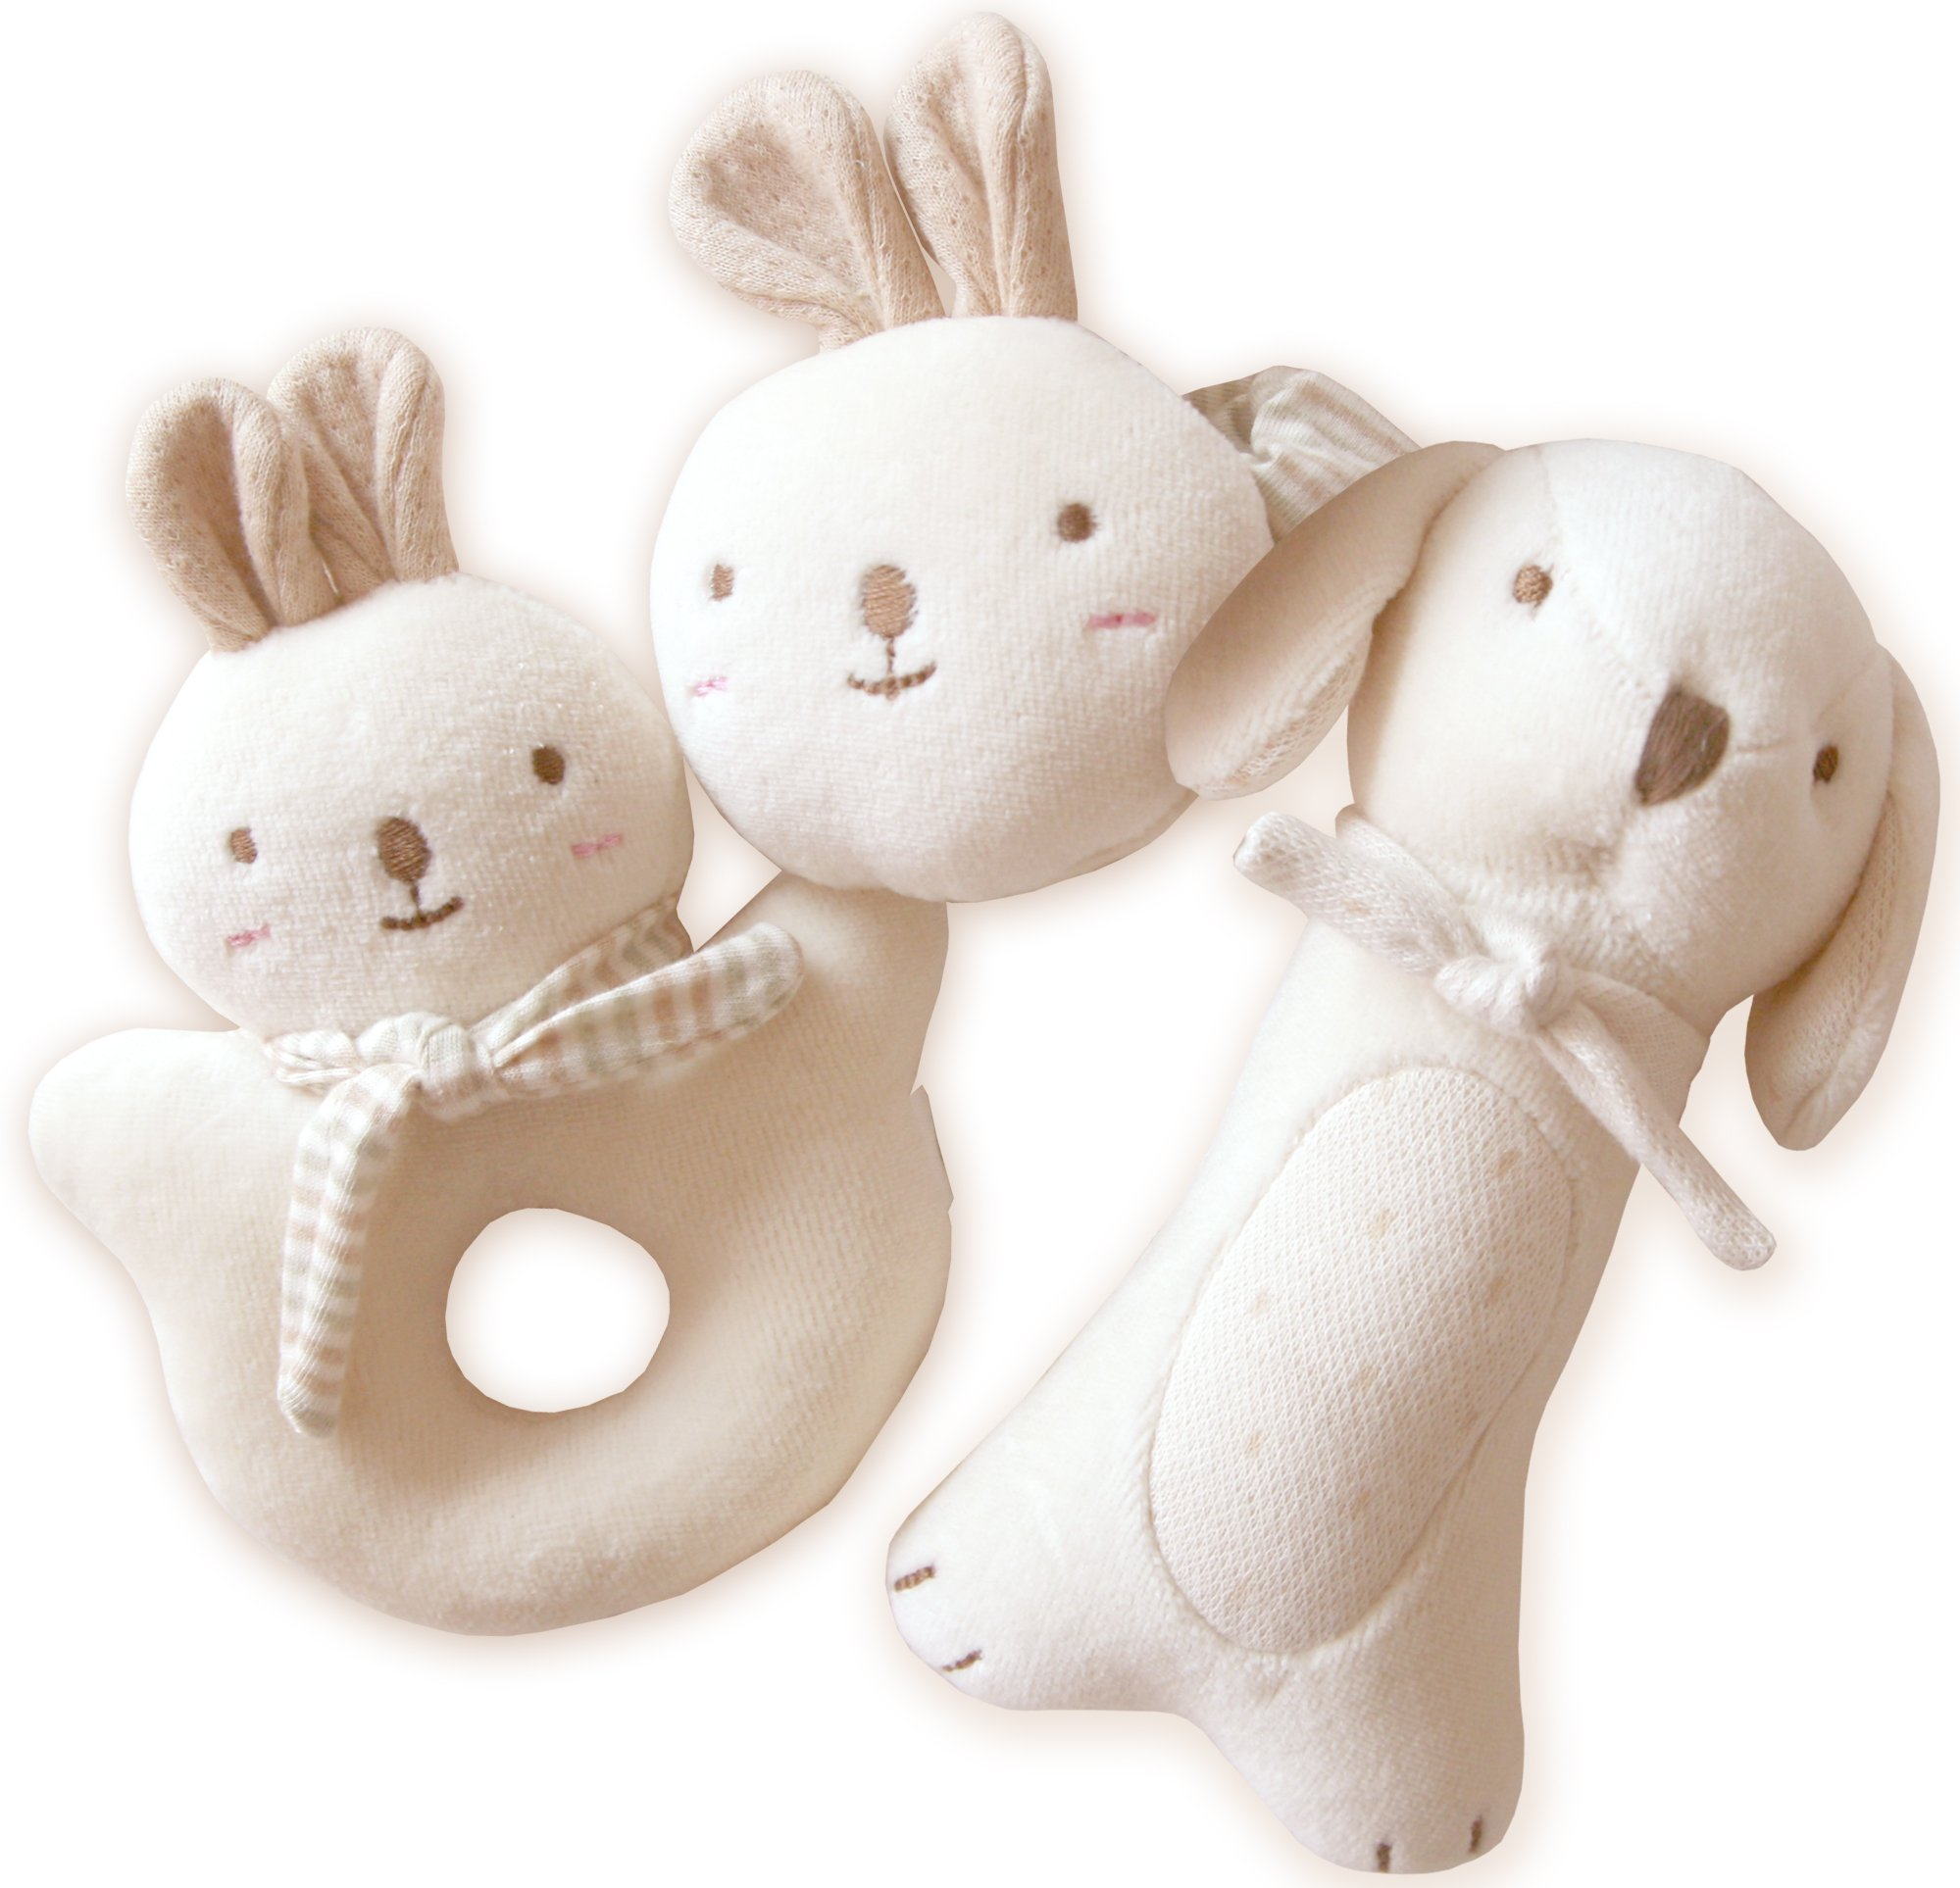 (Puppy & Baby Rabbit Rattle Set)100% Organic Cotton(No Dyeing Natural Organic Cotton) by JOHN N TREE Organic